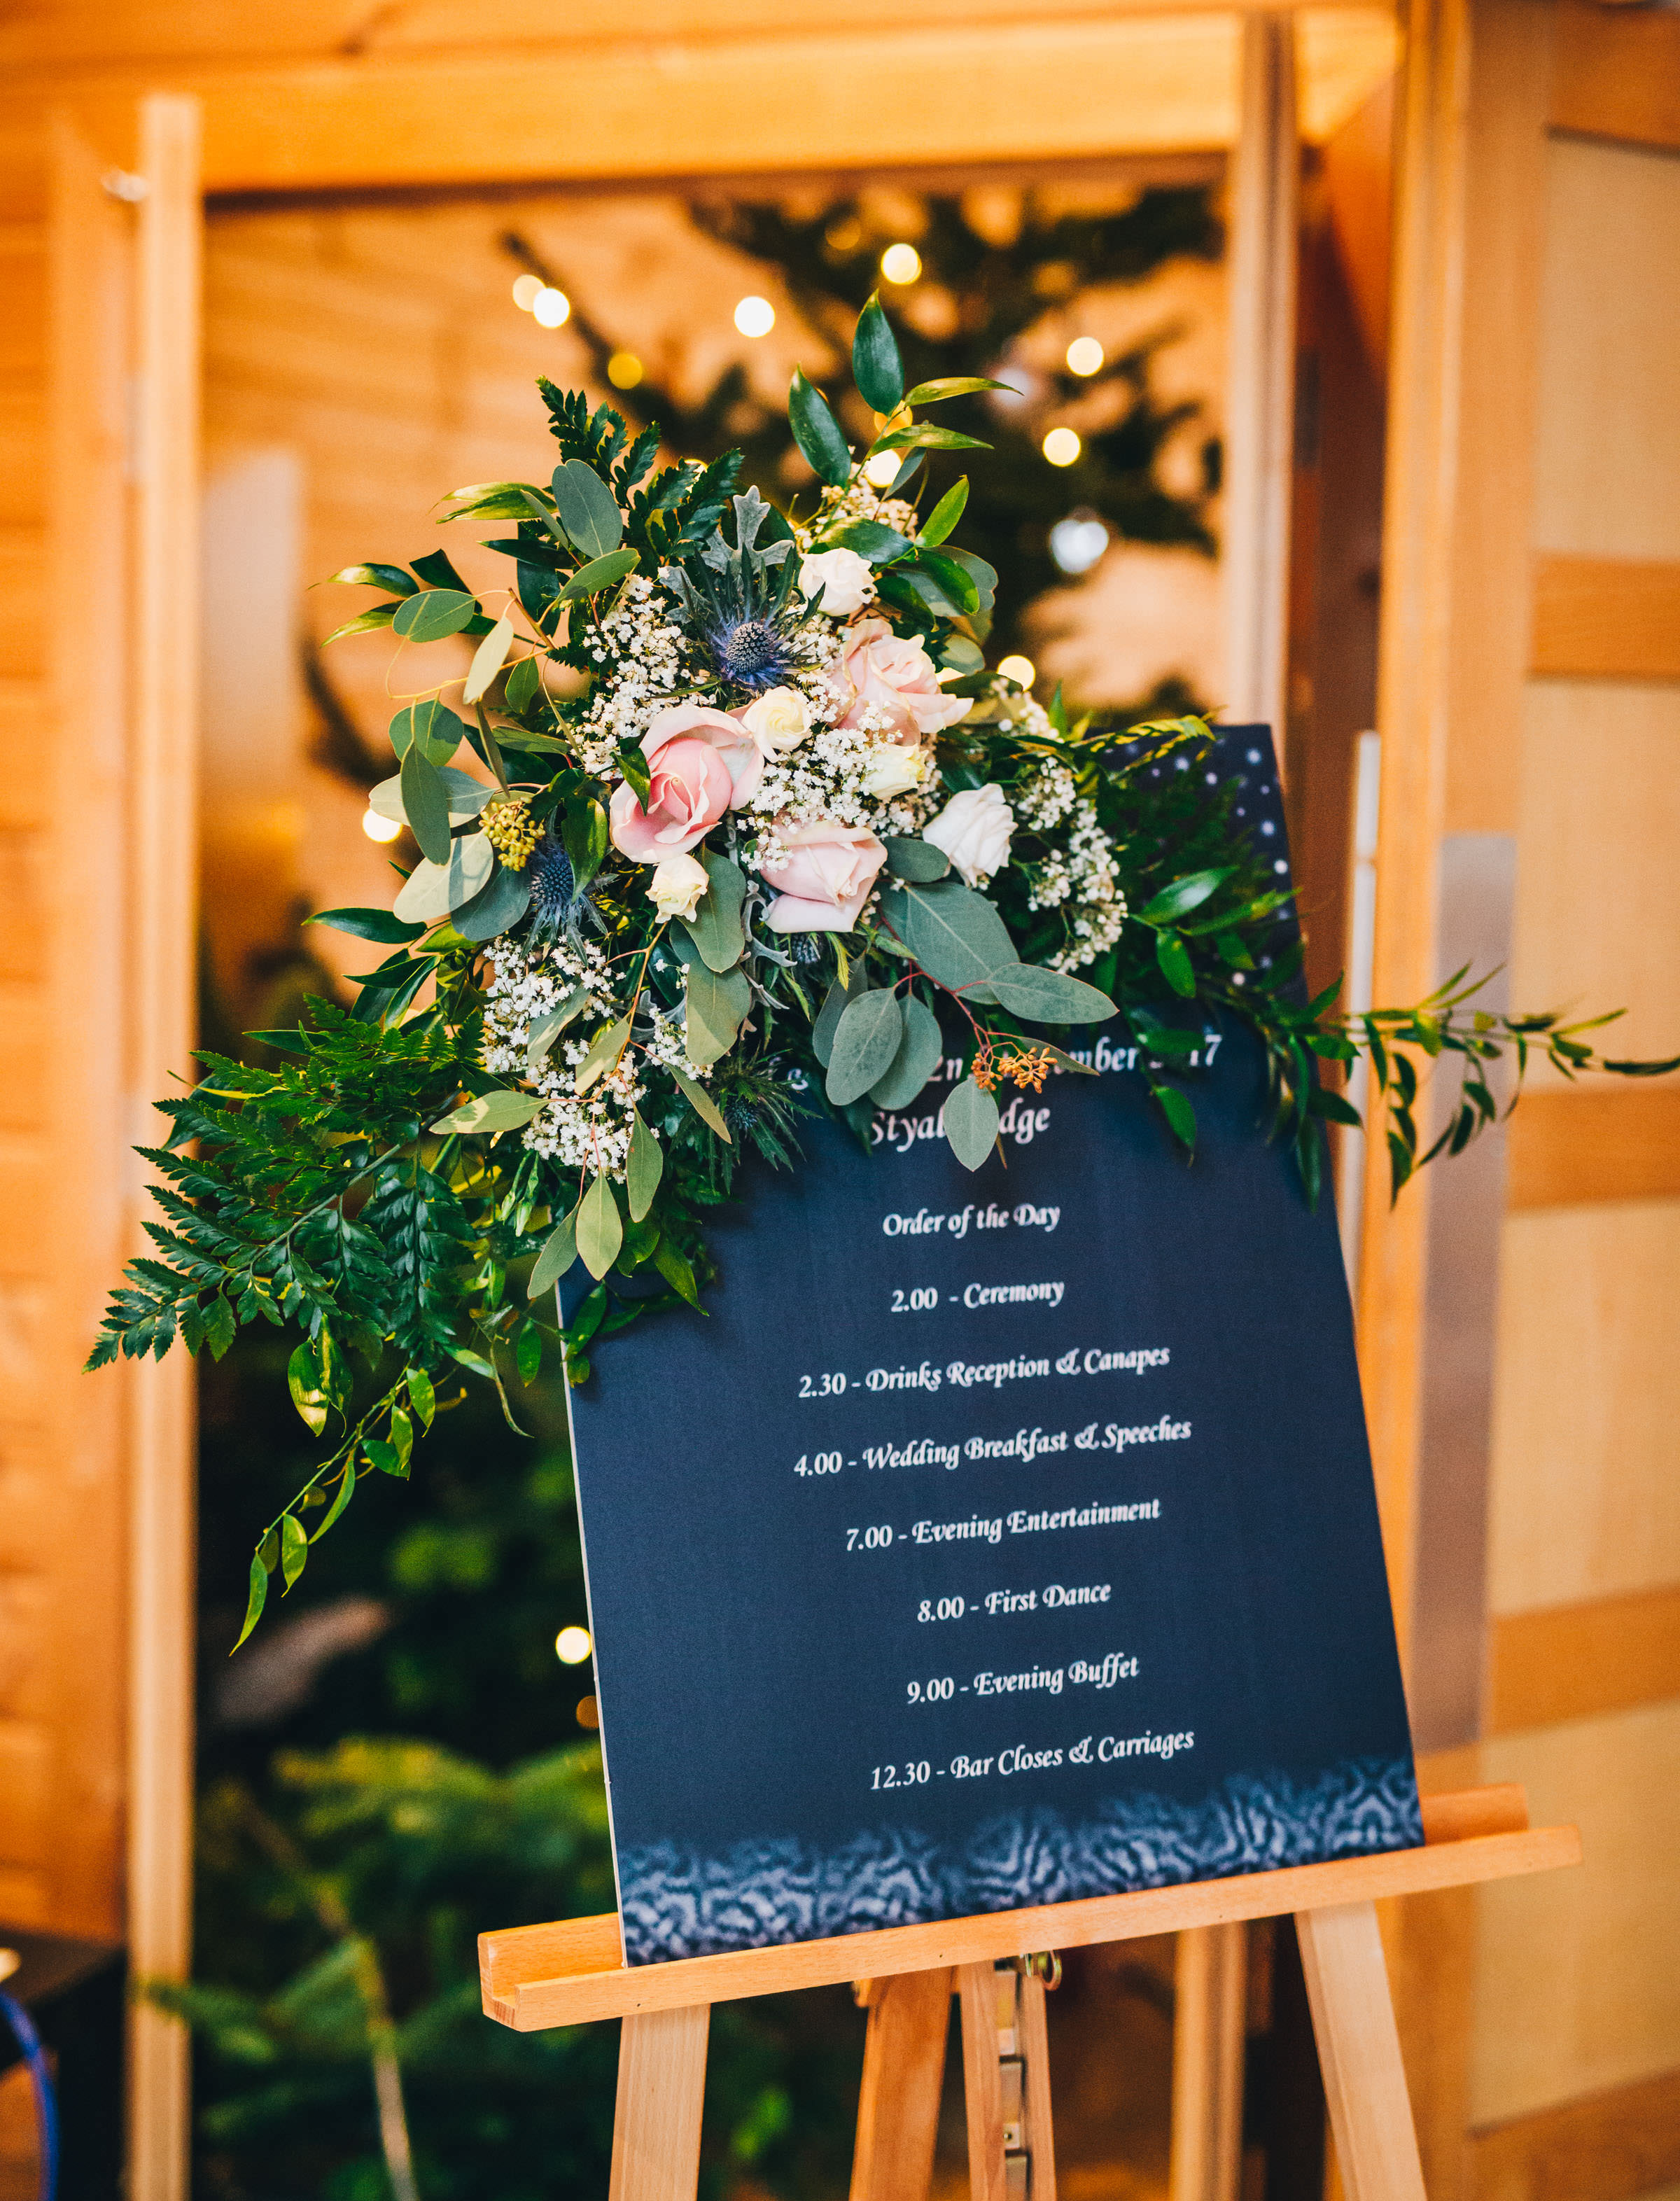 welcome to the Styal Lodge Wedding